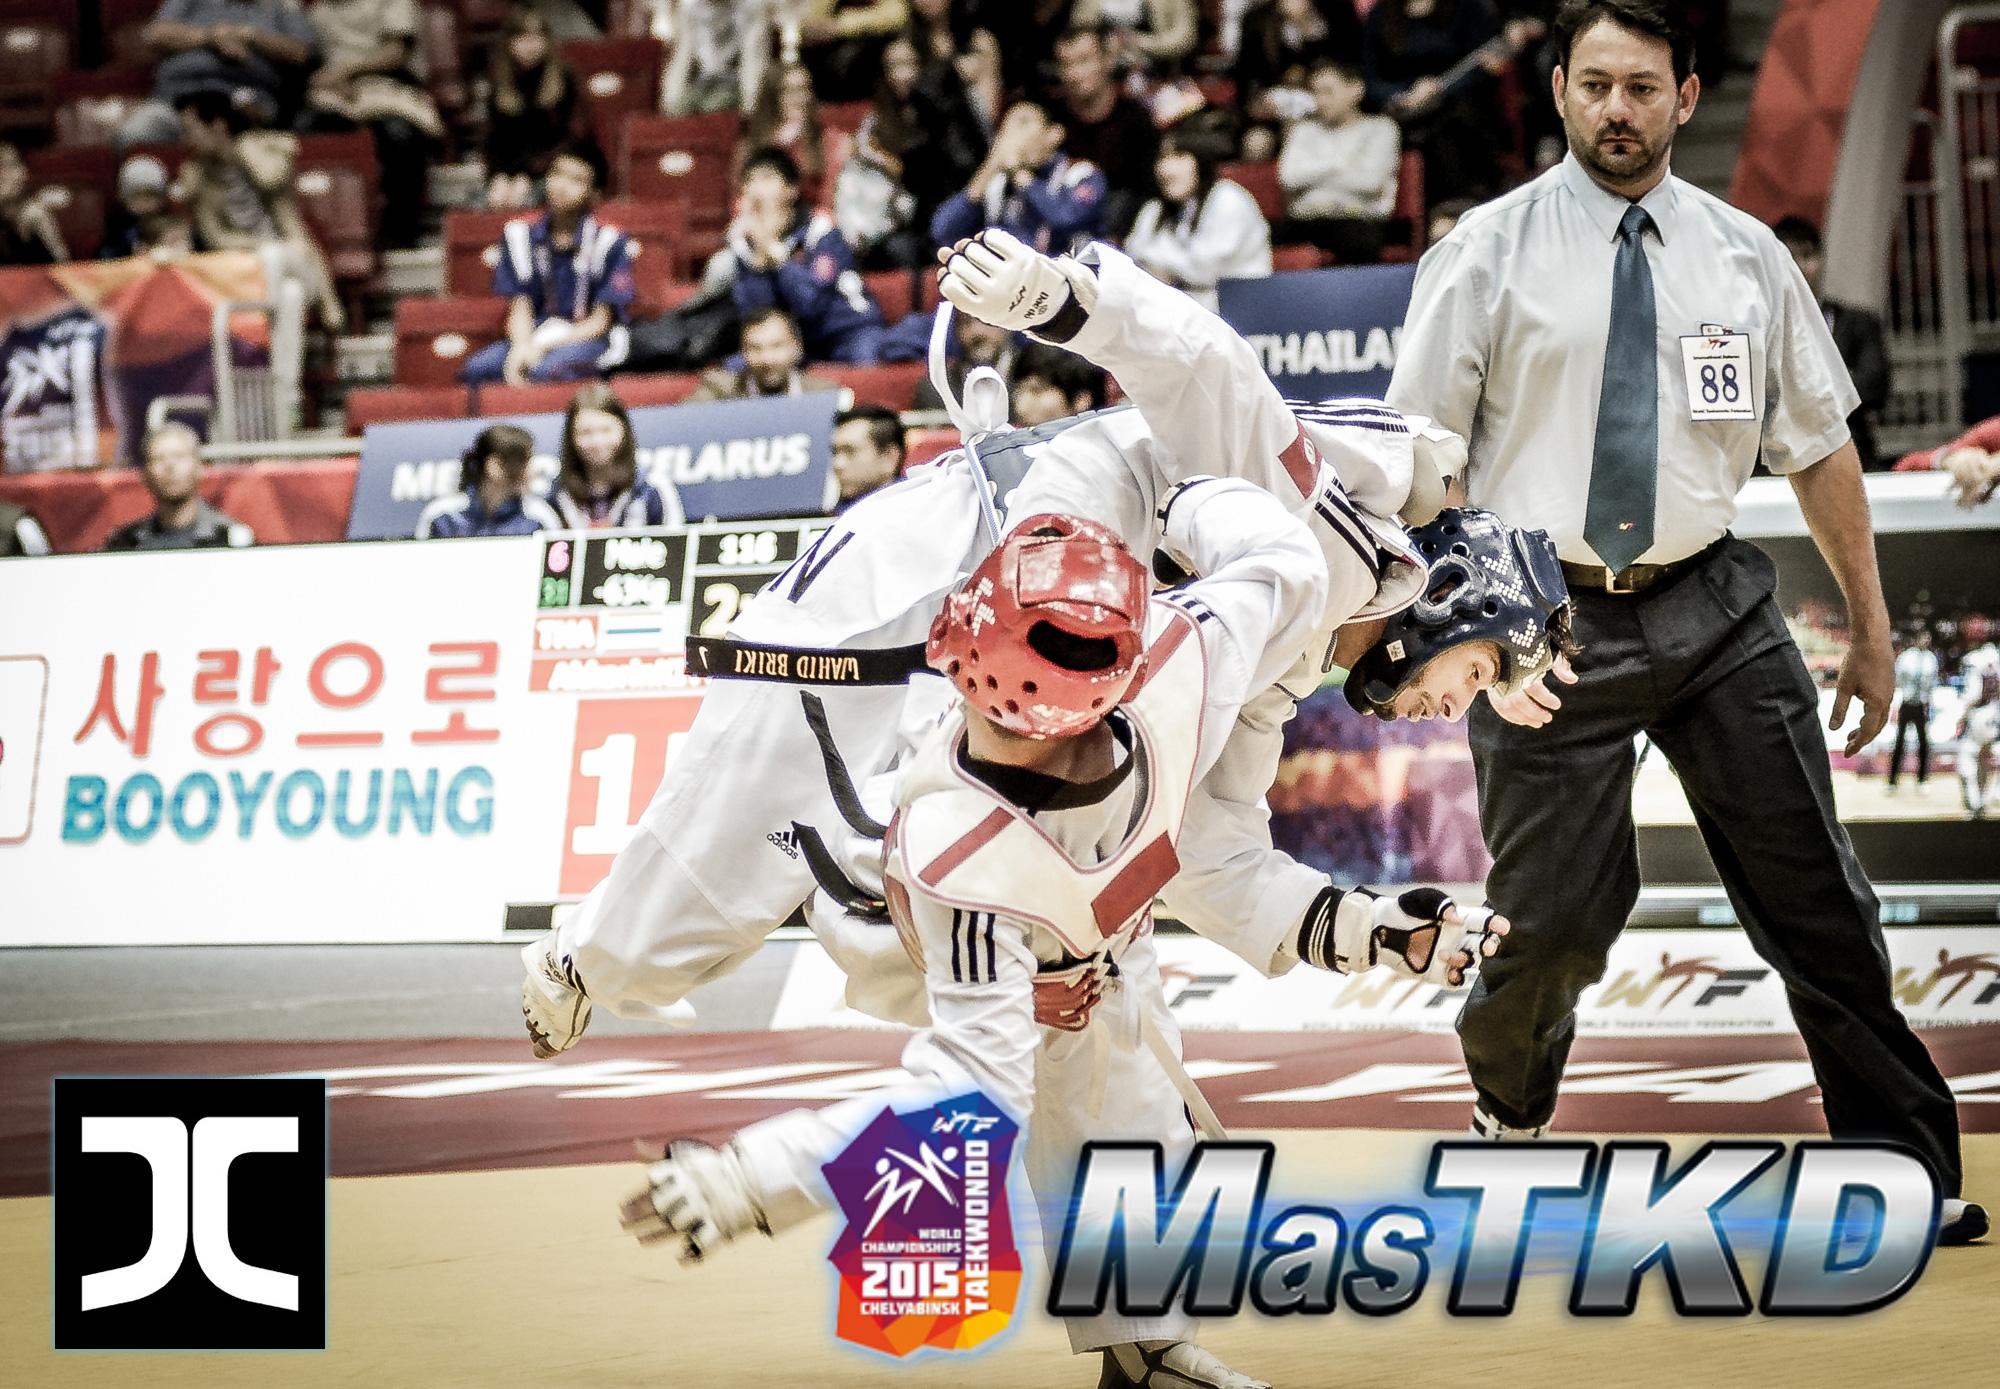 03_Mundial-Taekwondo_JCalicu-Seleccion-Mejor-Foto